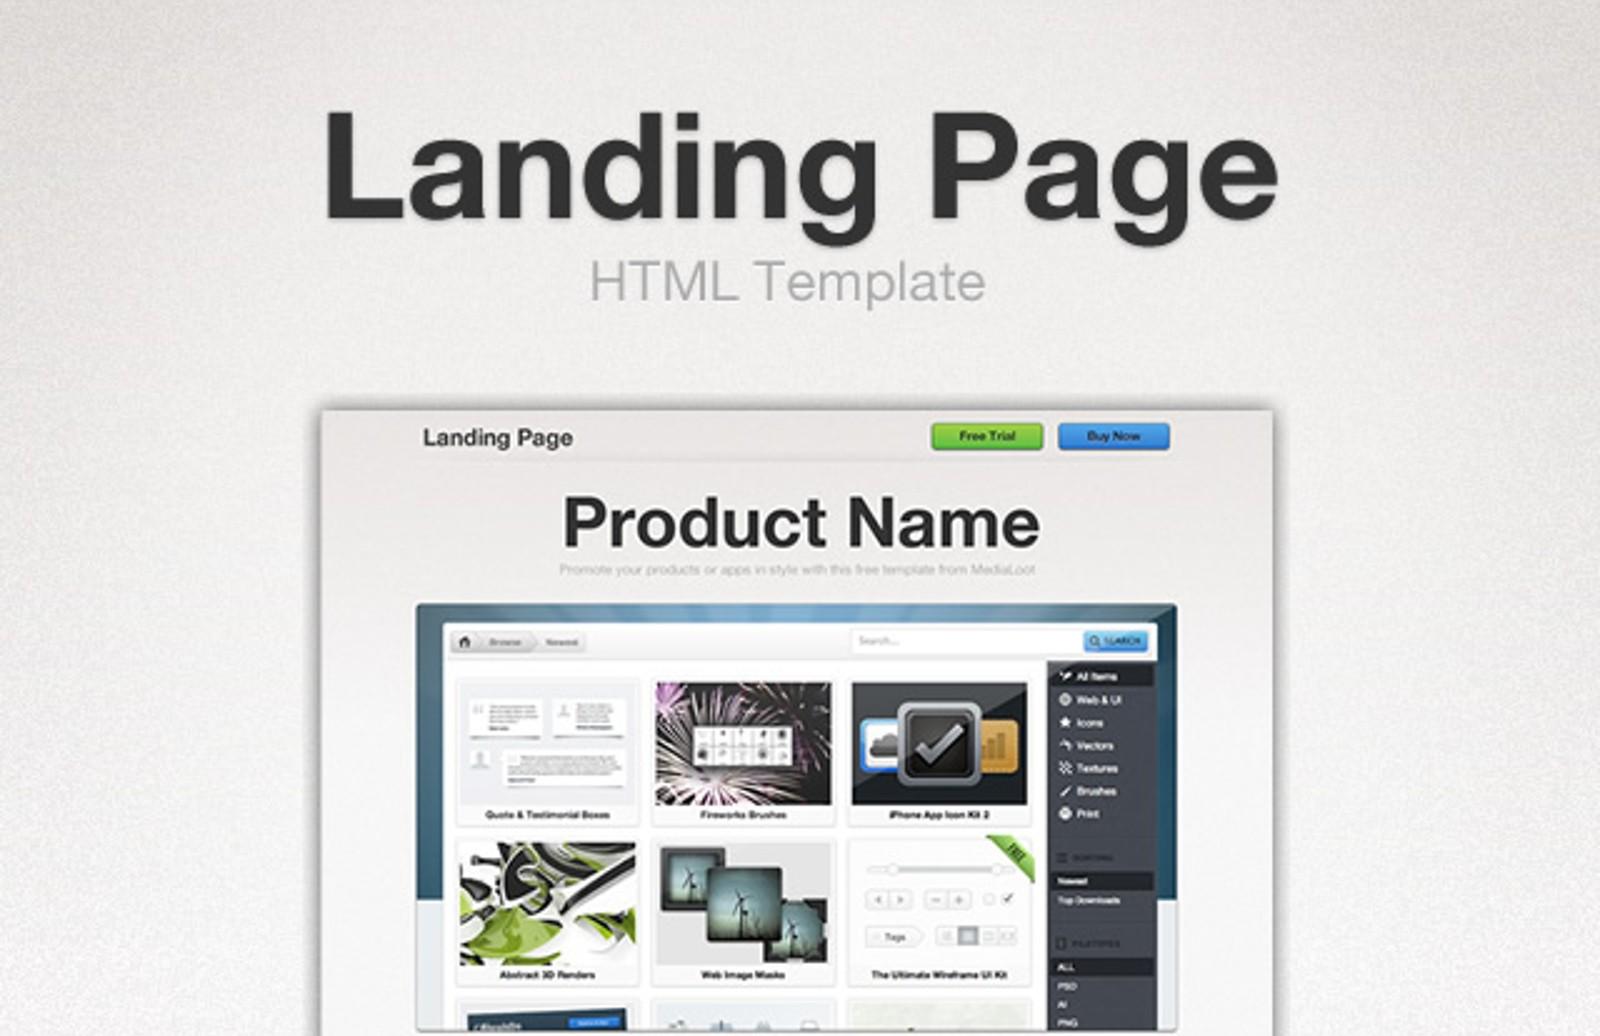 landing page html template medialoot. Black Bedroom Furniture Sets. Home Design Ideas